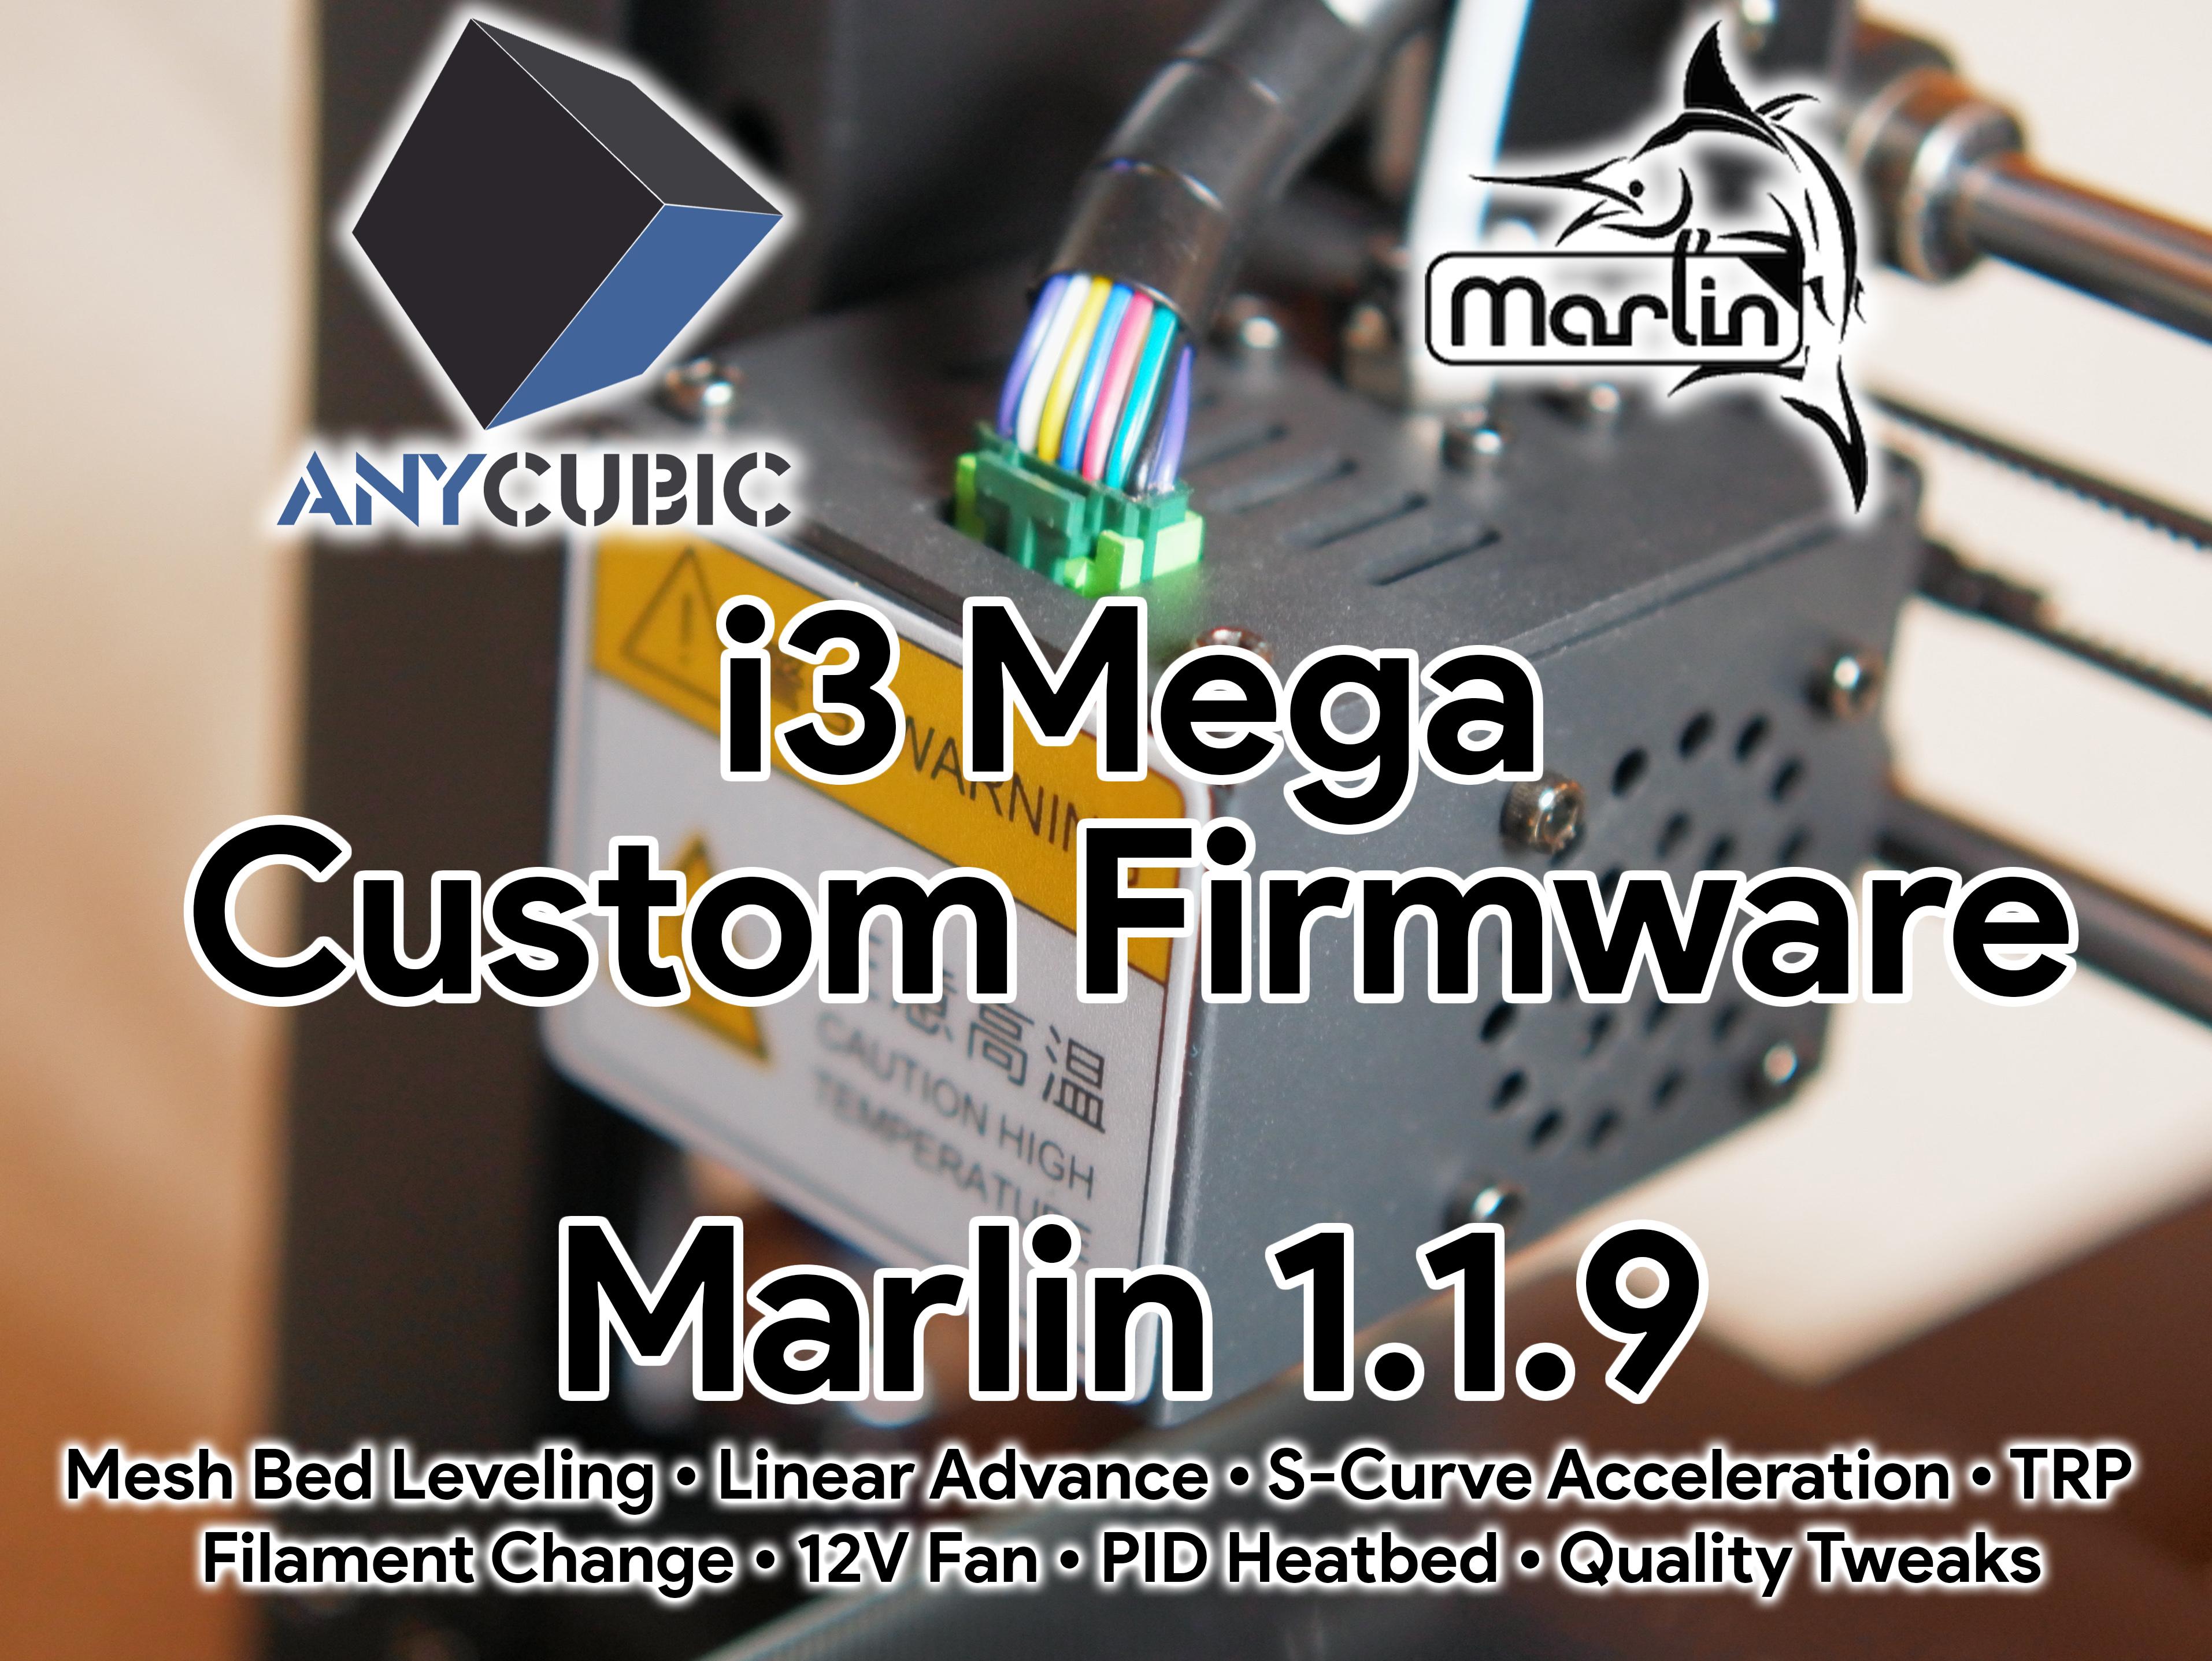 Anycubic i3 Mega / Mega-S Marlin 1 1 9 Custom Firmware